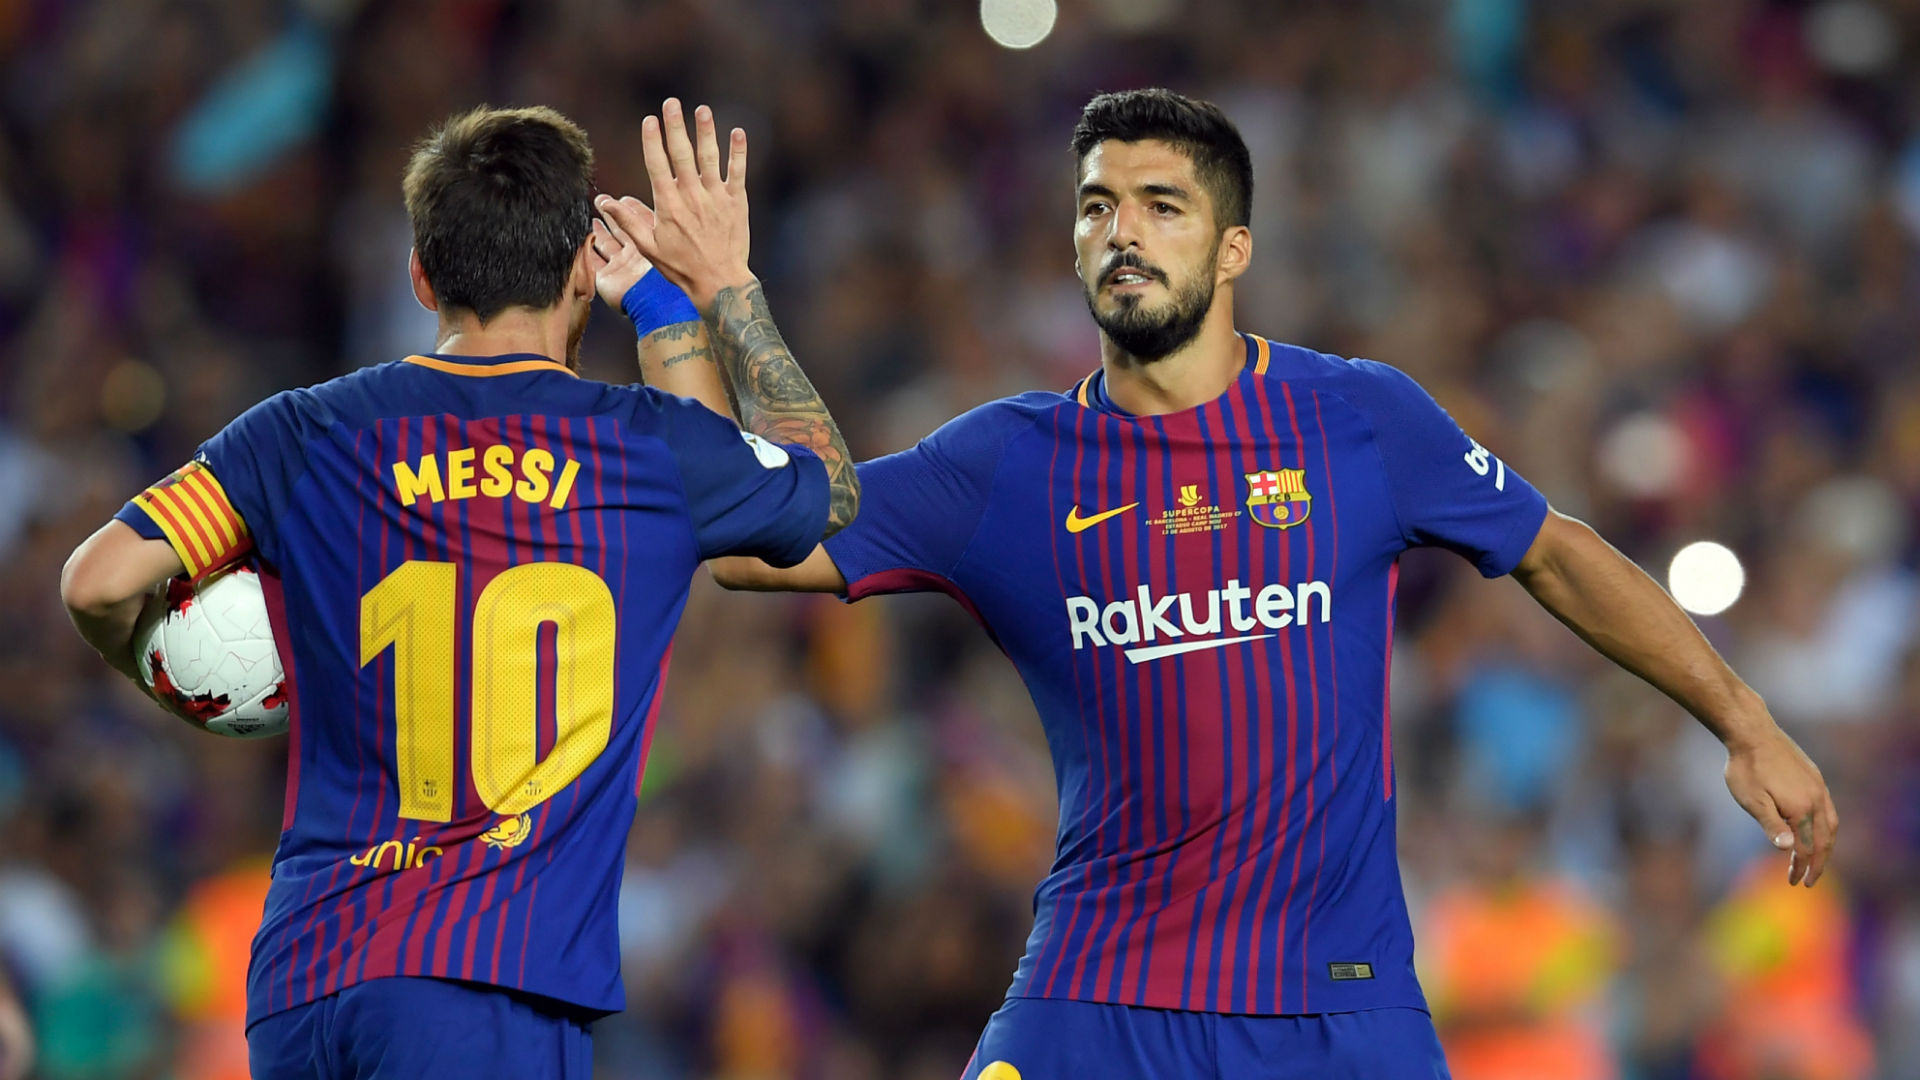 Barcelona vence o Getafe de virada e lidera a La Liga